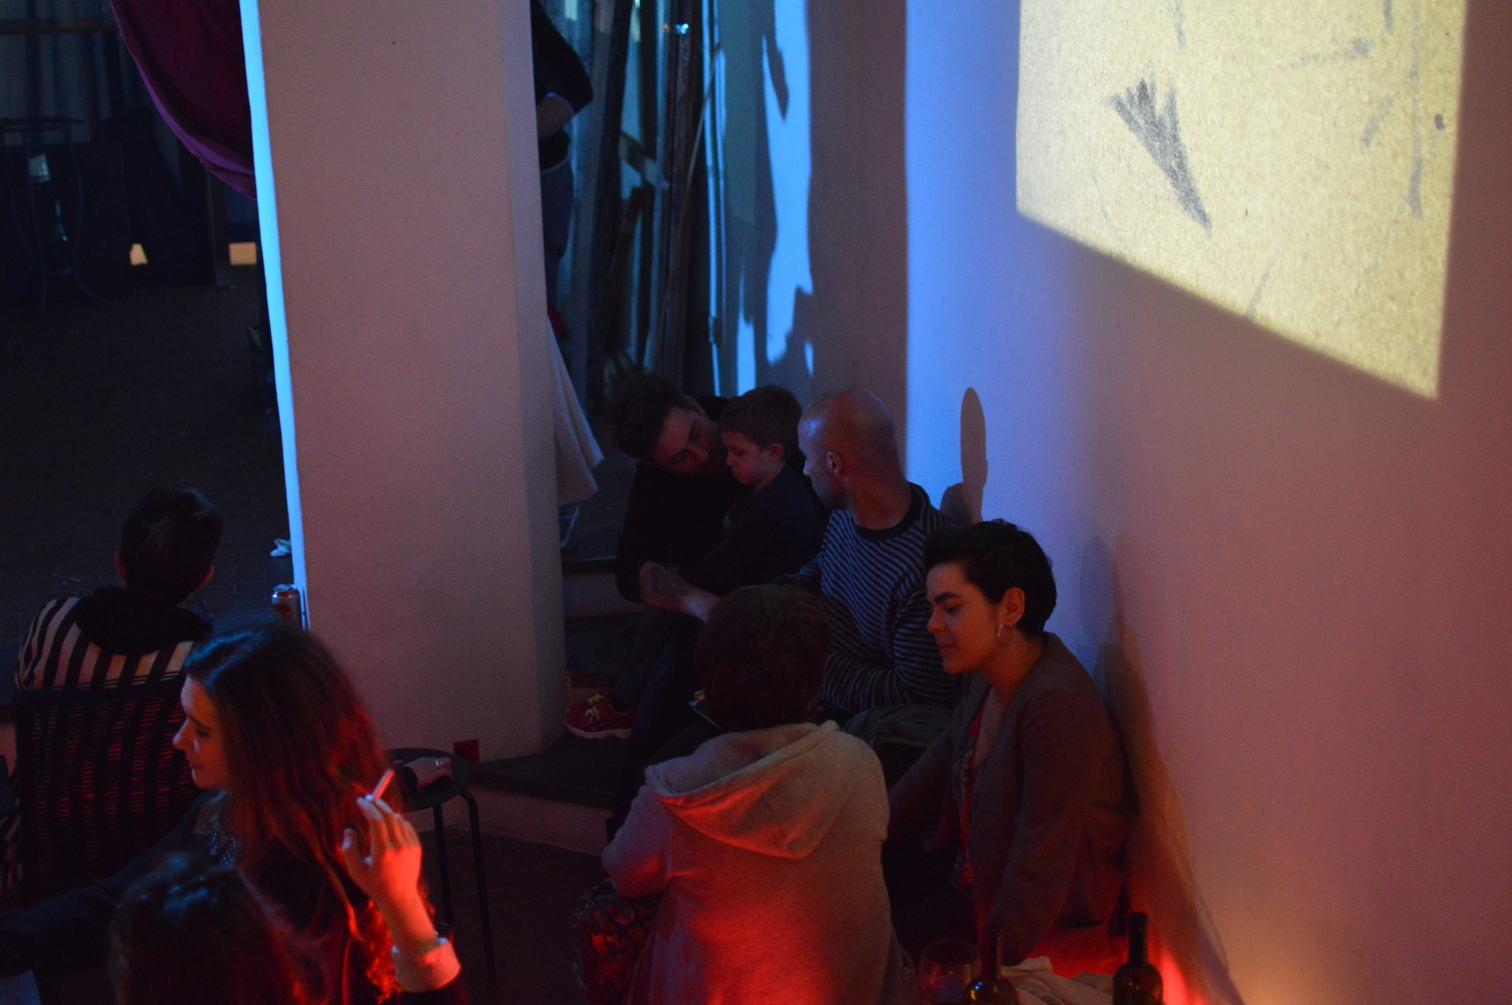 IlGattaRossa - 15 Apr 2015 - I Mangiatori Di Teste - DSC_0004